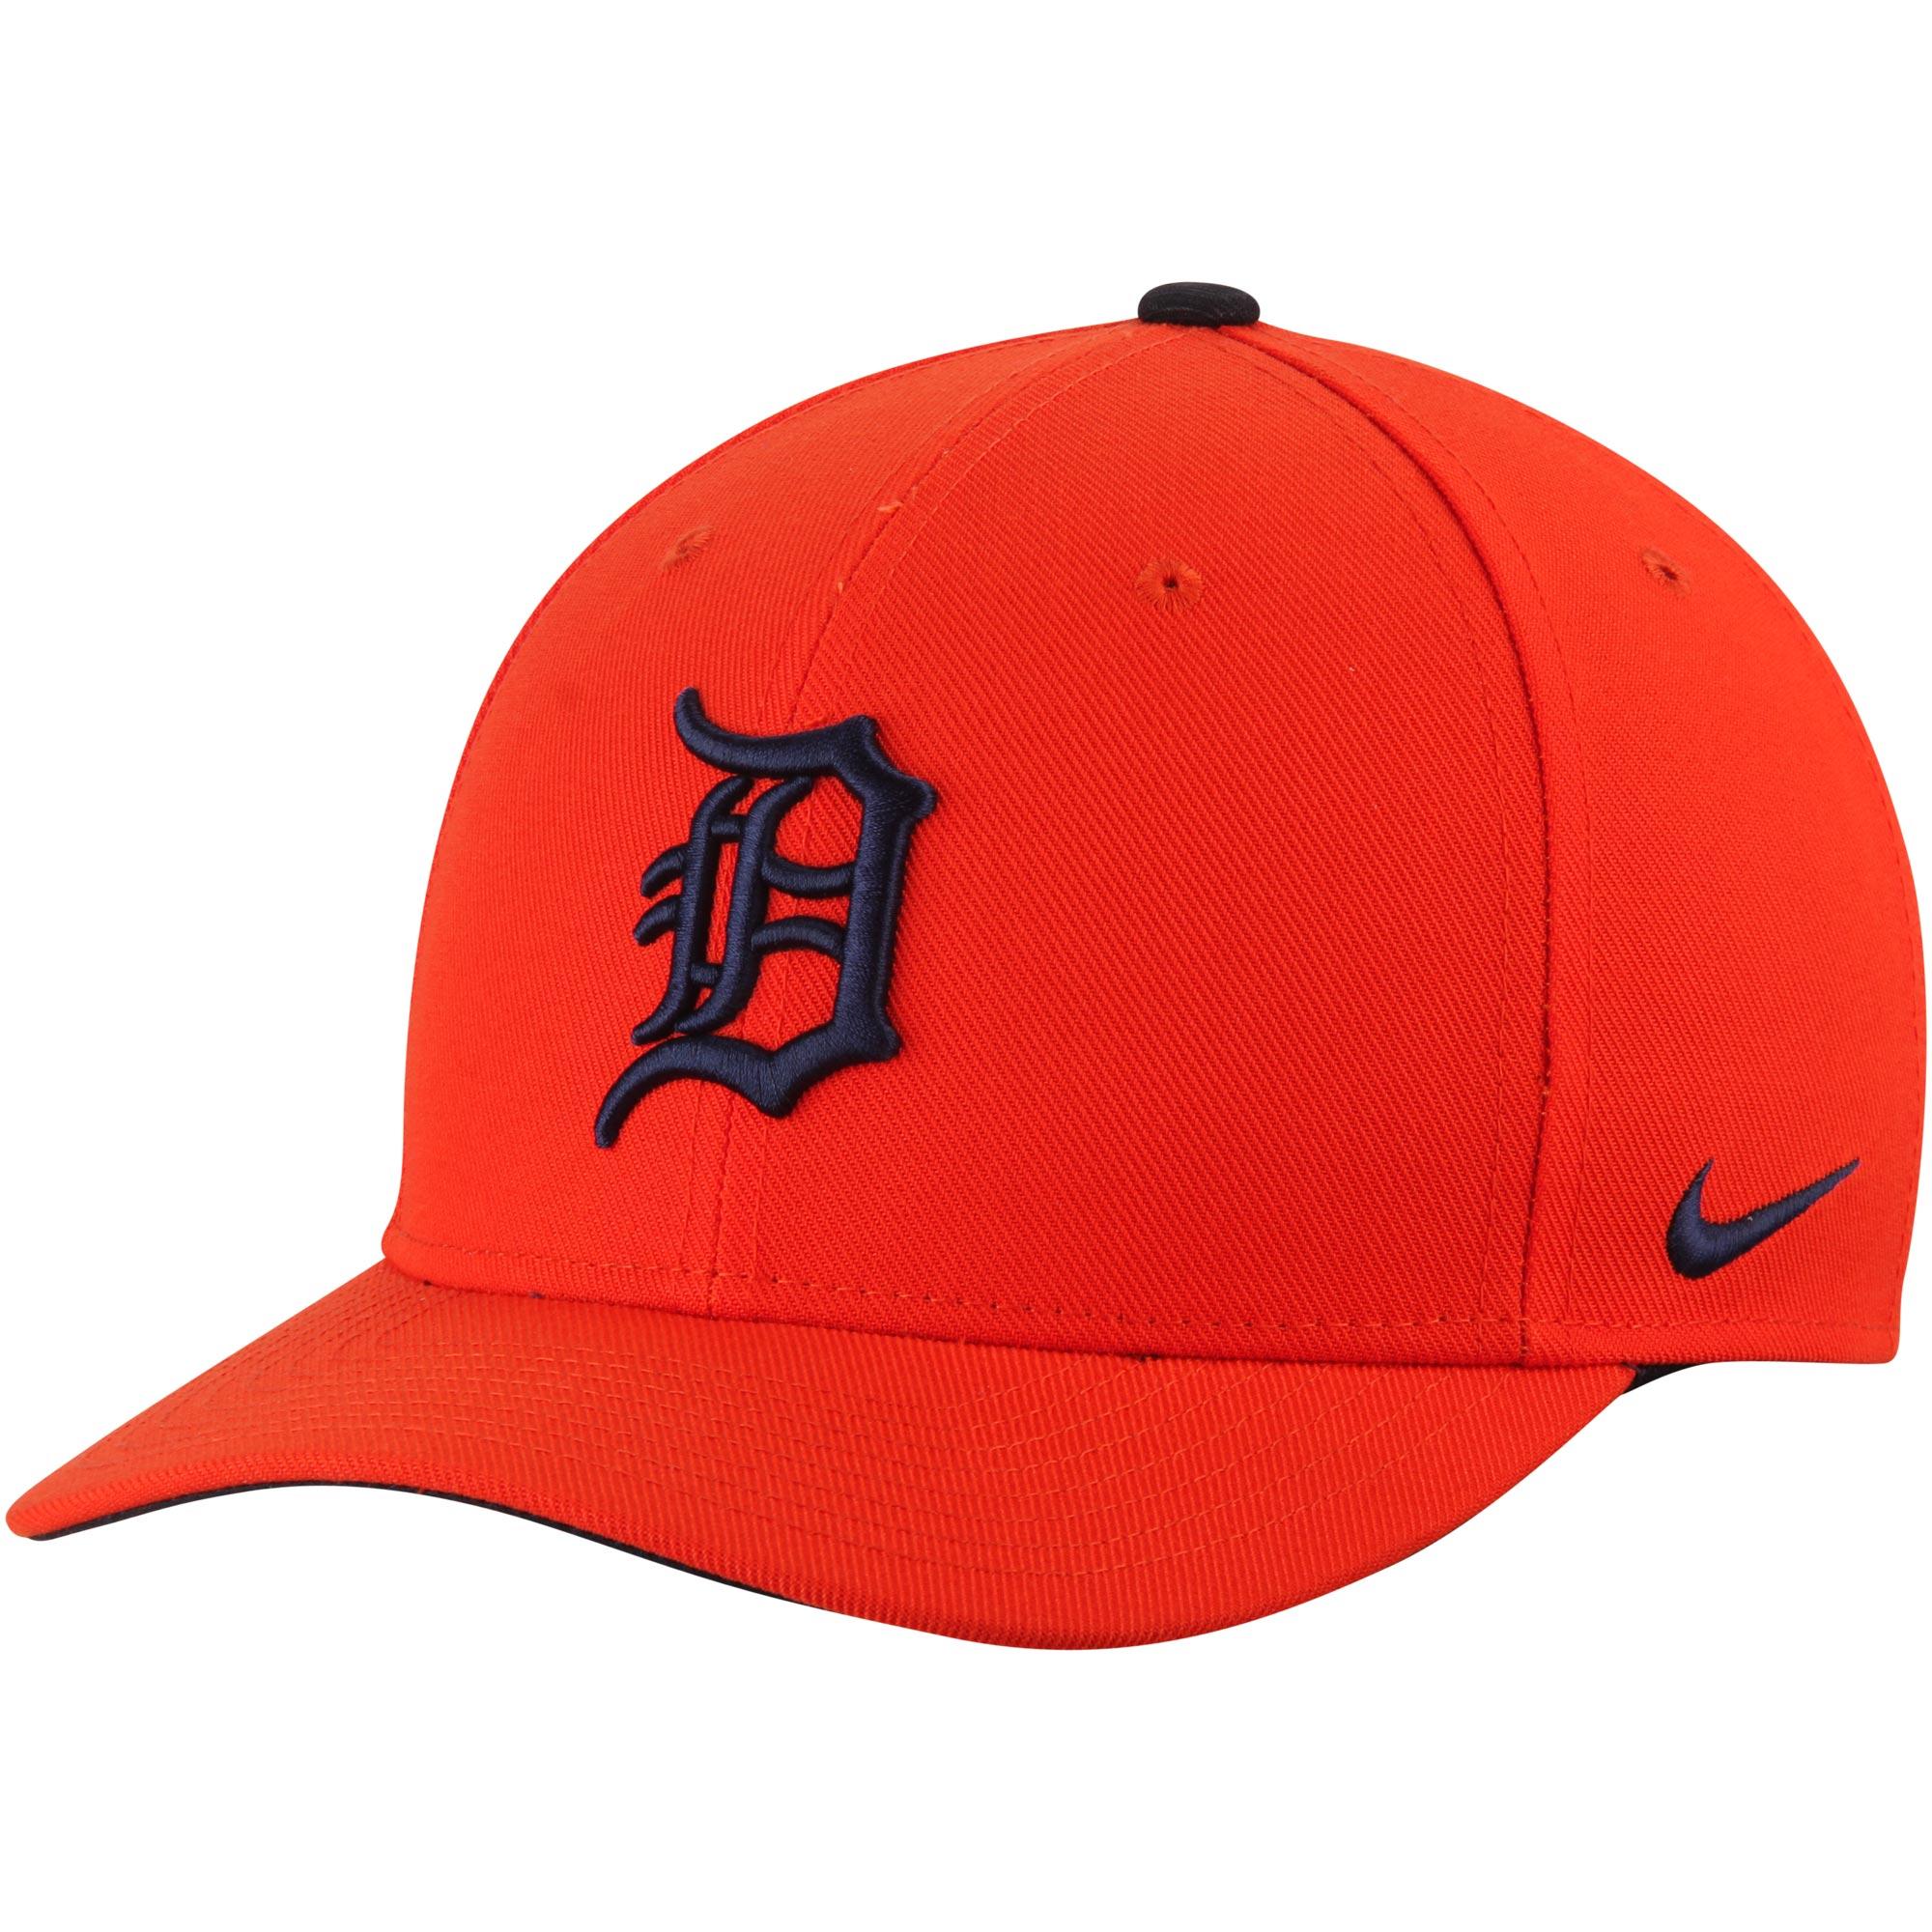 Detroit Tigers Nike Wool Classic Adjustable Performance Hat - Orange - OSFA